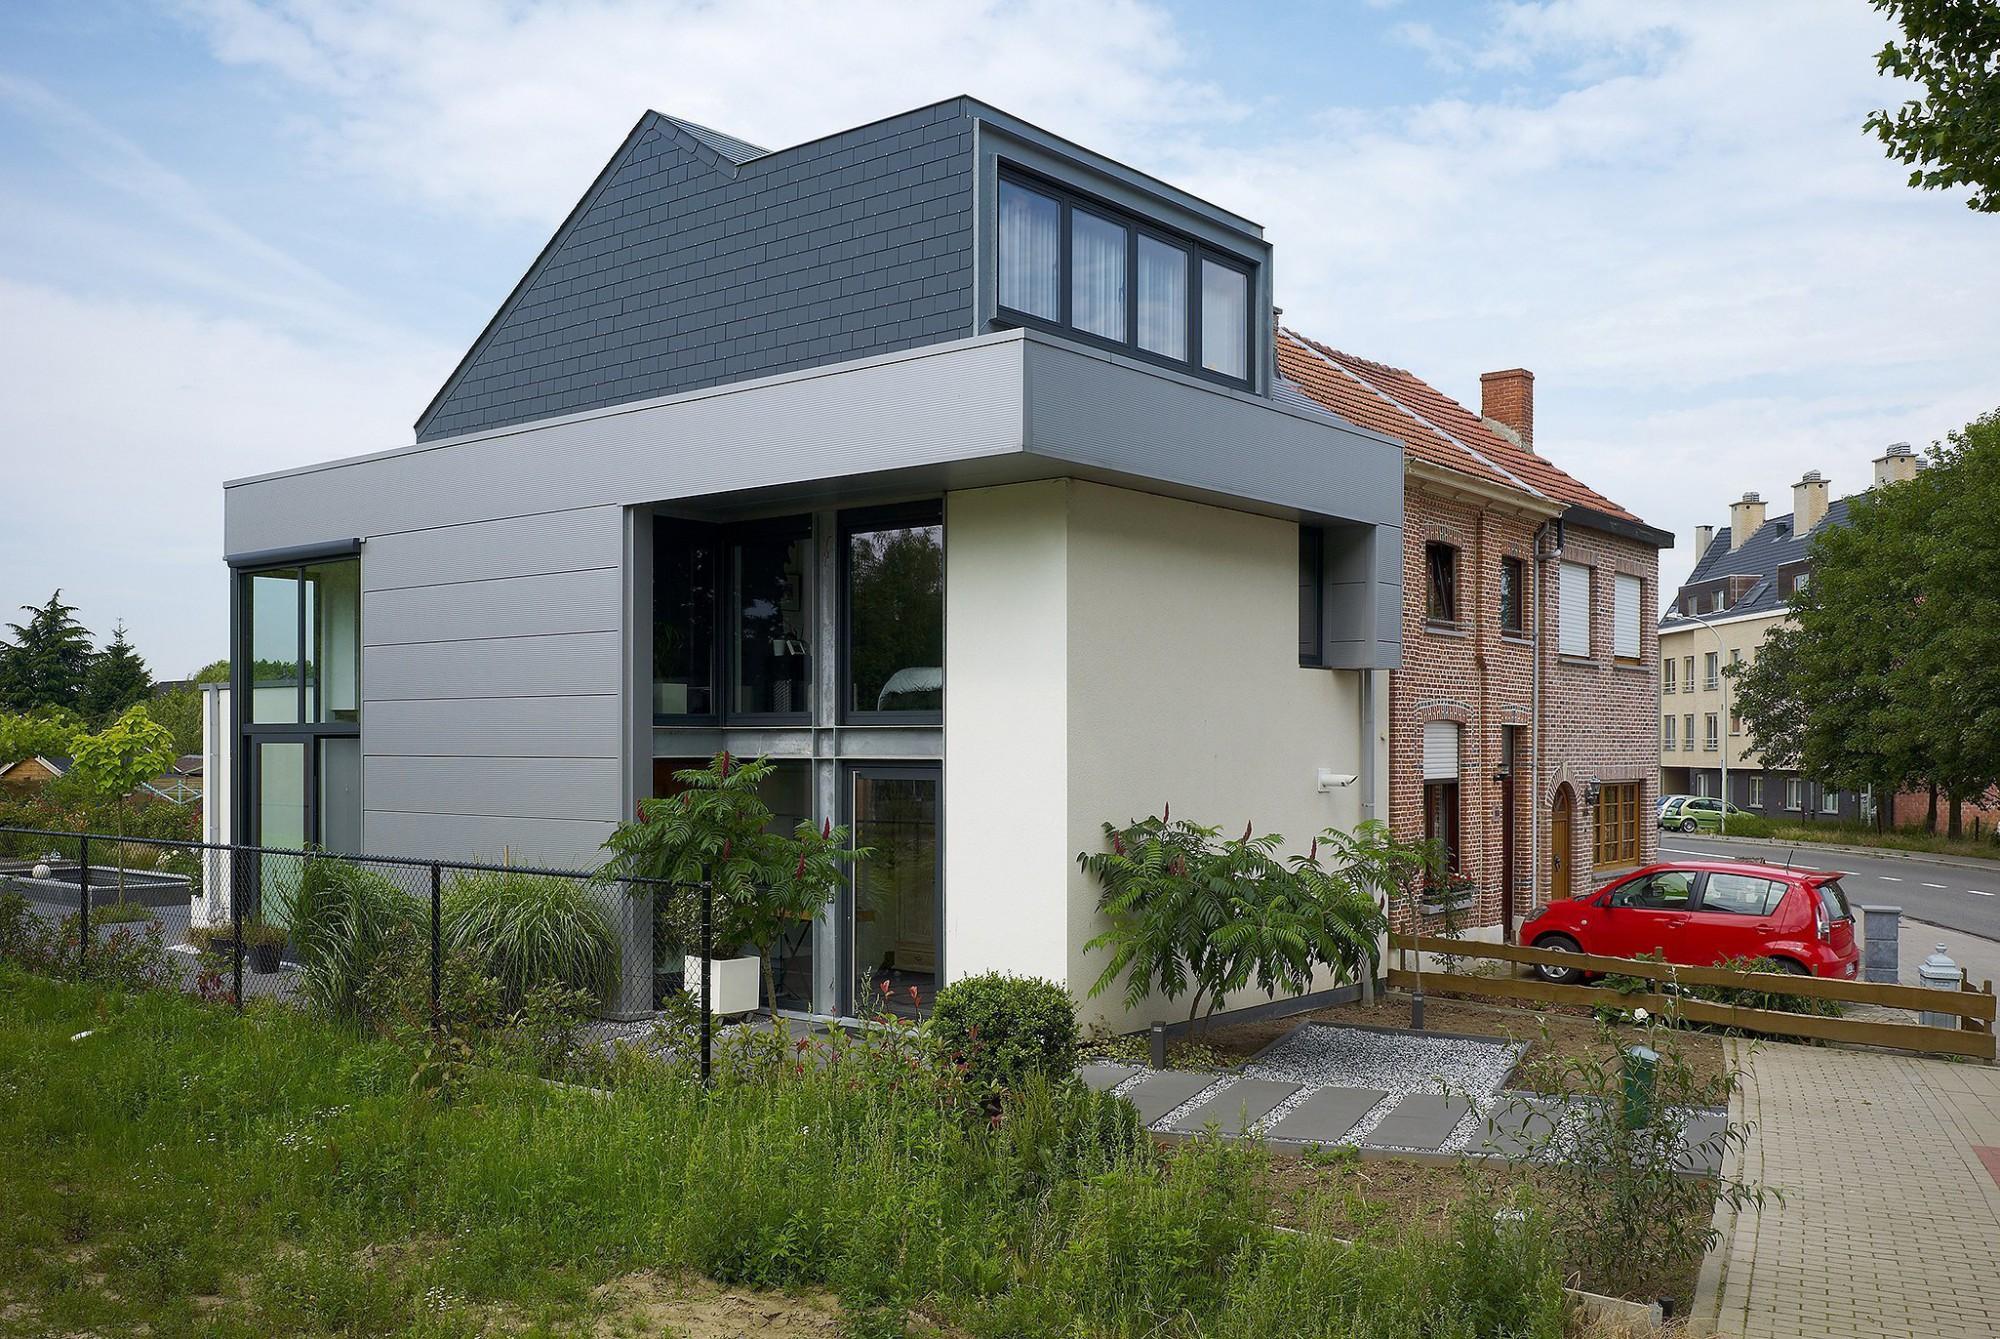 Afbeelding: Architectuur fotografie, moderne woning Boom, voor BVV architecten.